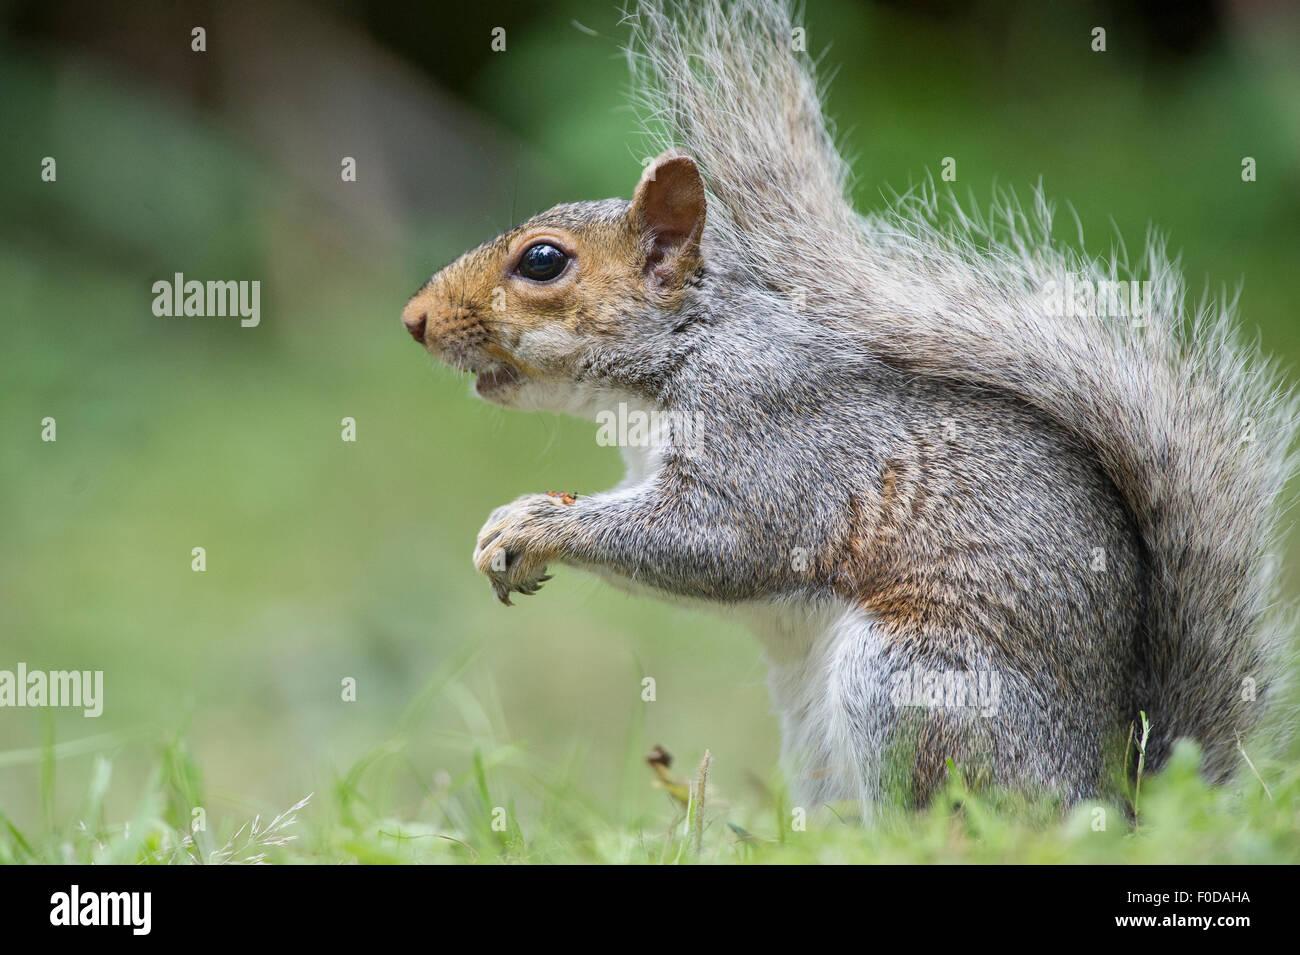 A Grey Squirrel (also known as Eastern Gray Squirrel (Sciurus carolinensis). Stock Photo